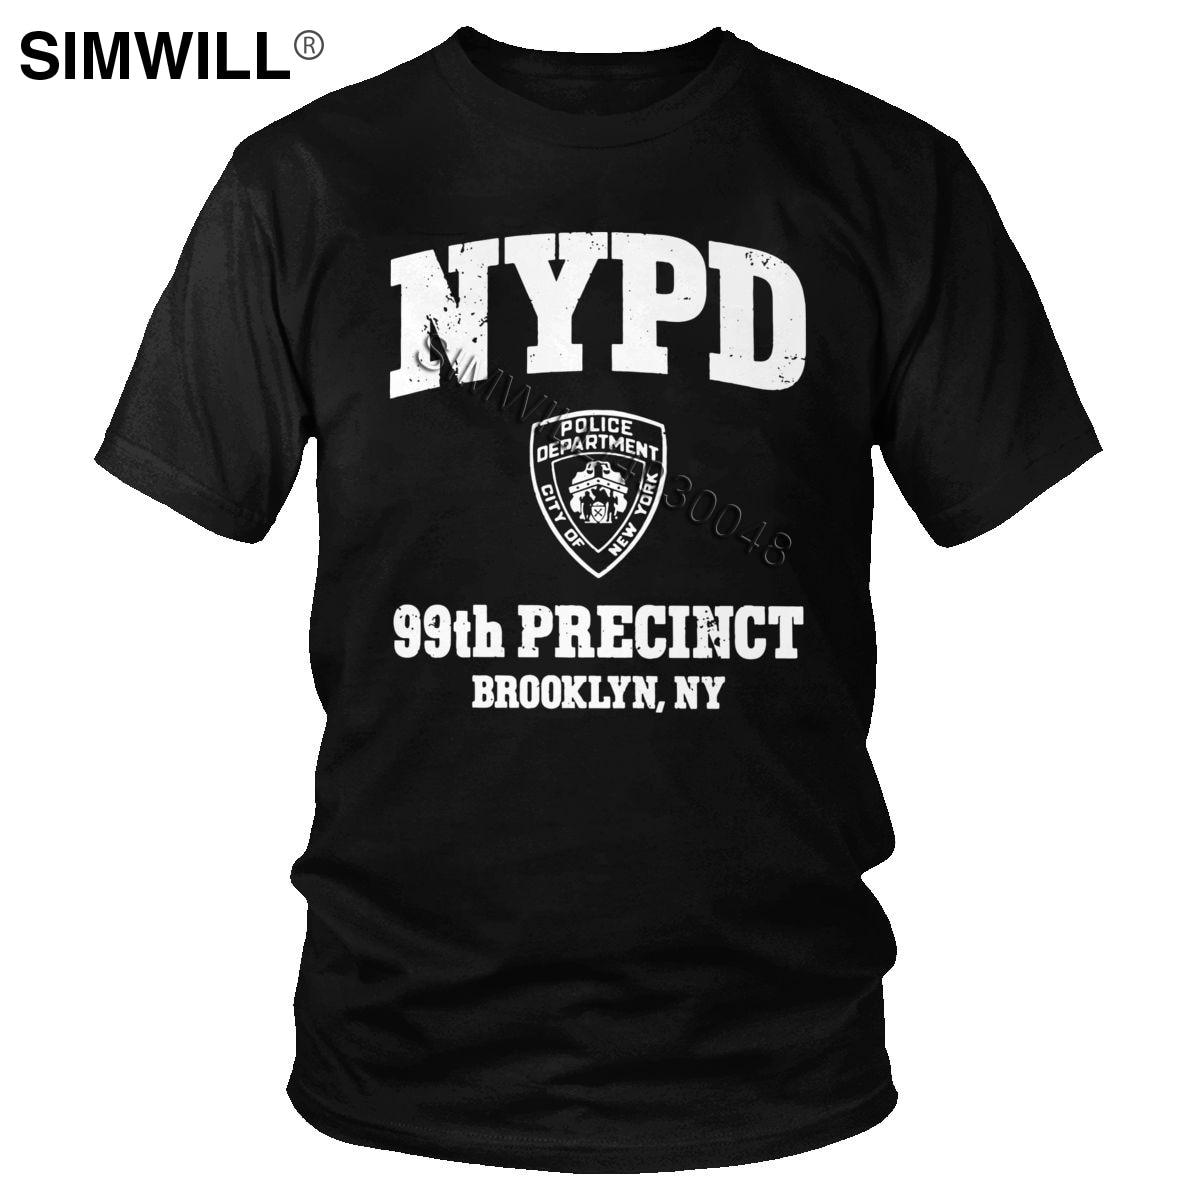 Мужская футболка в стиле ретро Brooklyn Nine, экологичный хлопок, 99-й участок, Бруклин, NY 99, футболка с короткими рукавами, приталенная, ТВ Мерч, фут...